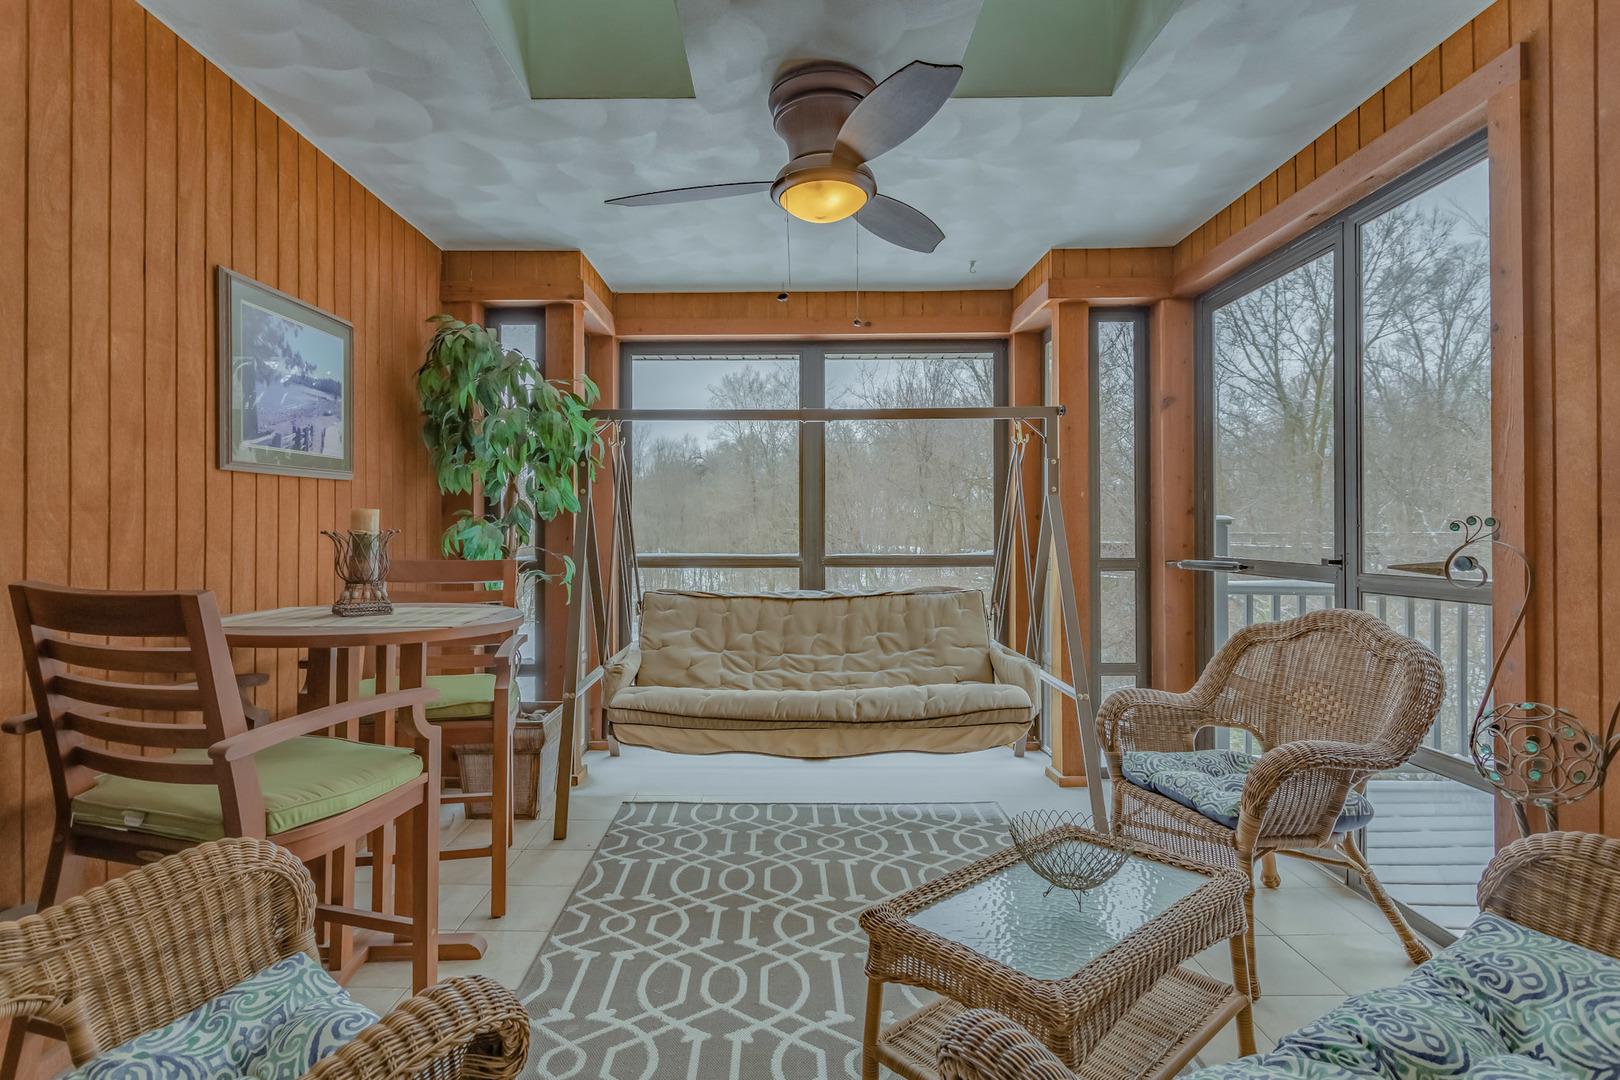 5707 Willow Creek 0, Roscoe, Illinois, 61073